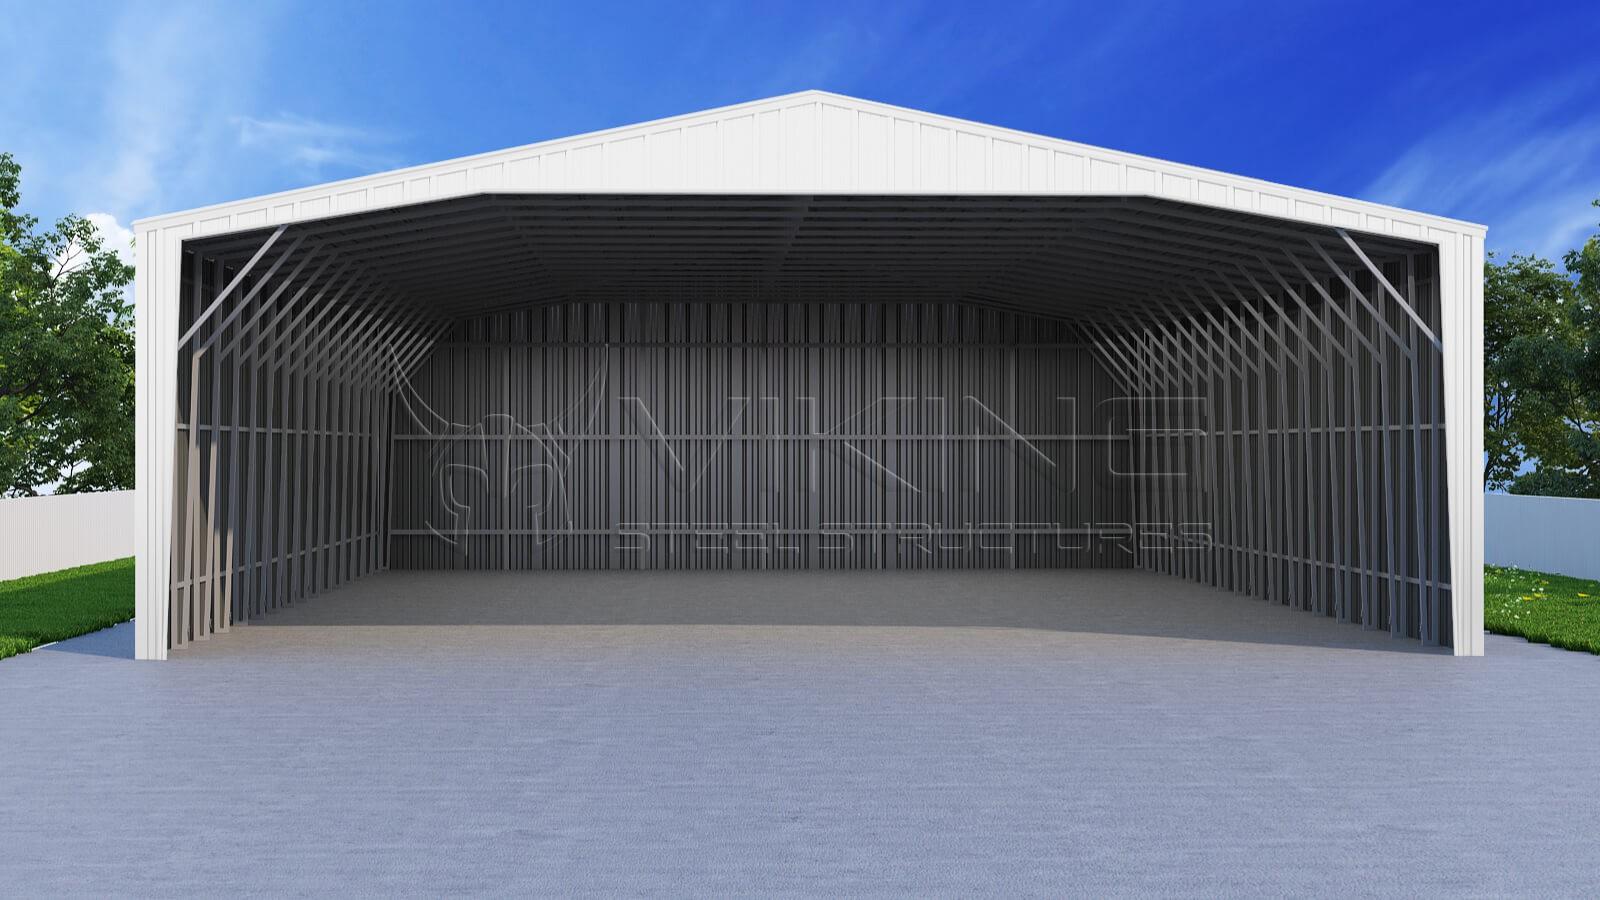 Enclosed Metal Carport : Enclosed steel carport